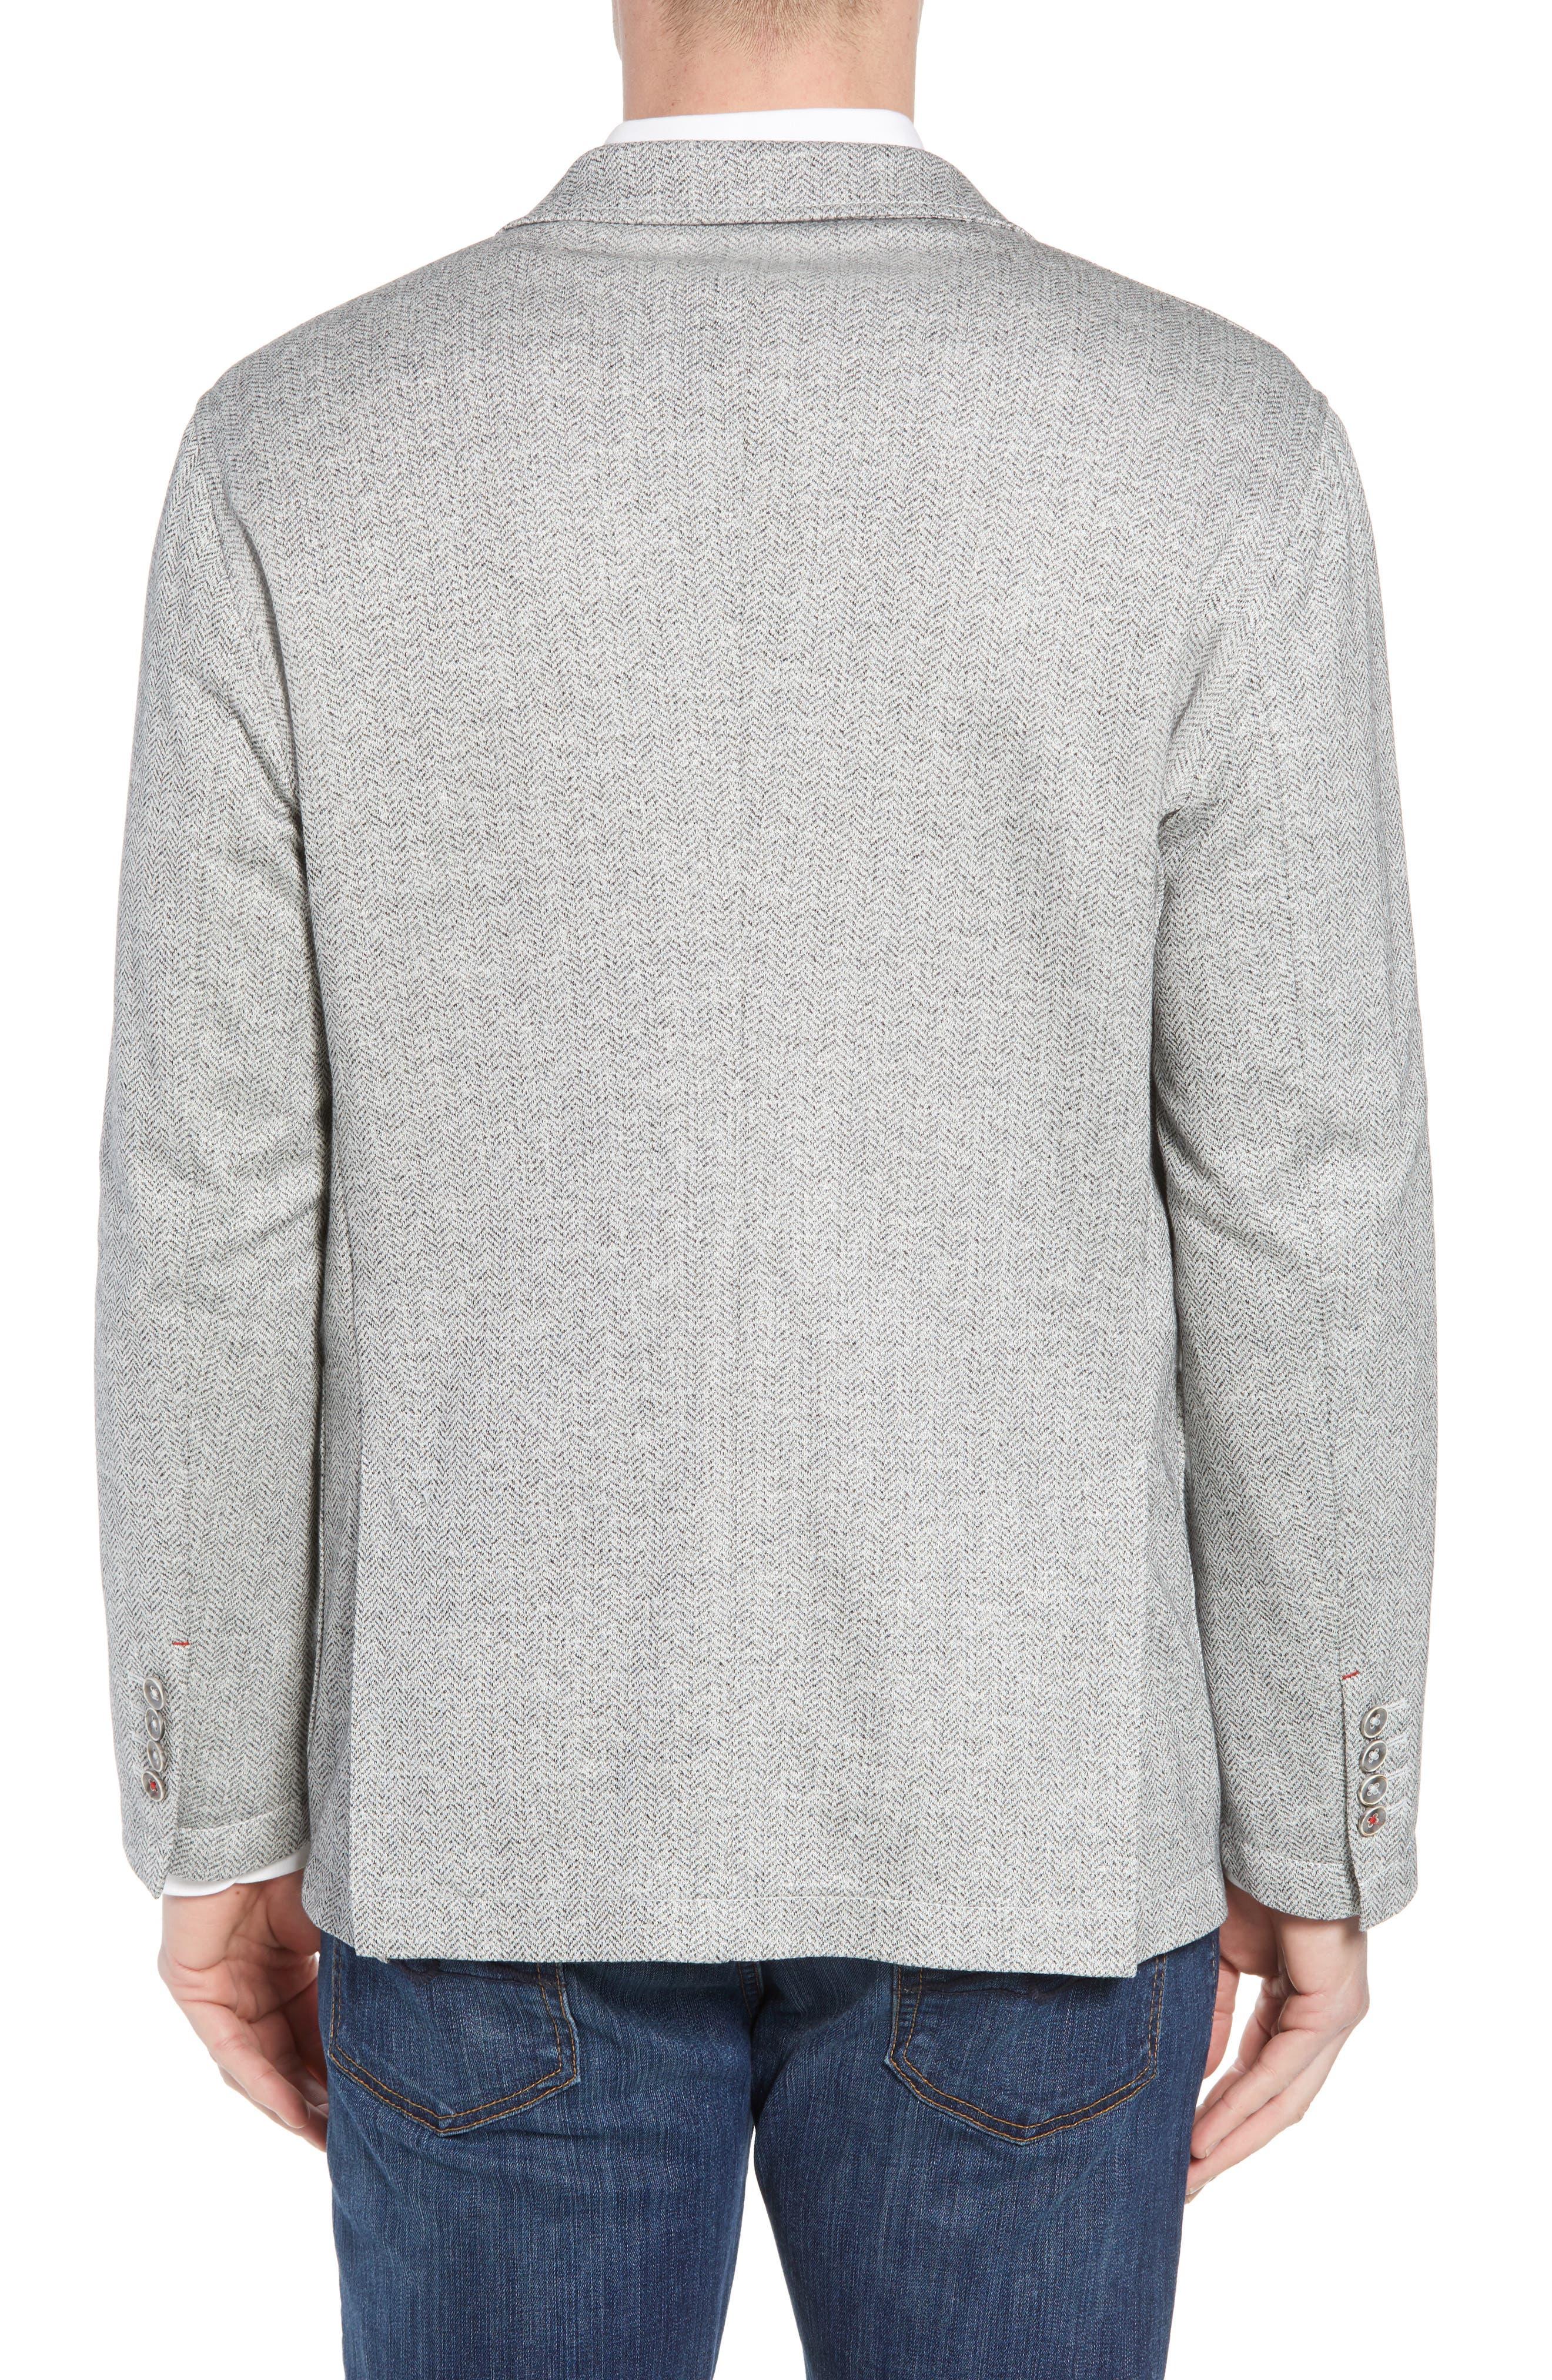 Alternate Image 2  - Bugatchi Regular Fit Herringbone Cotton & Linen Blazer